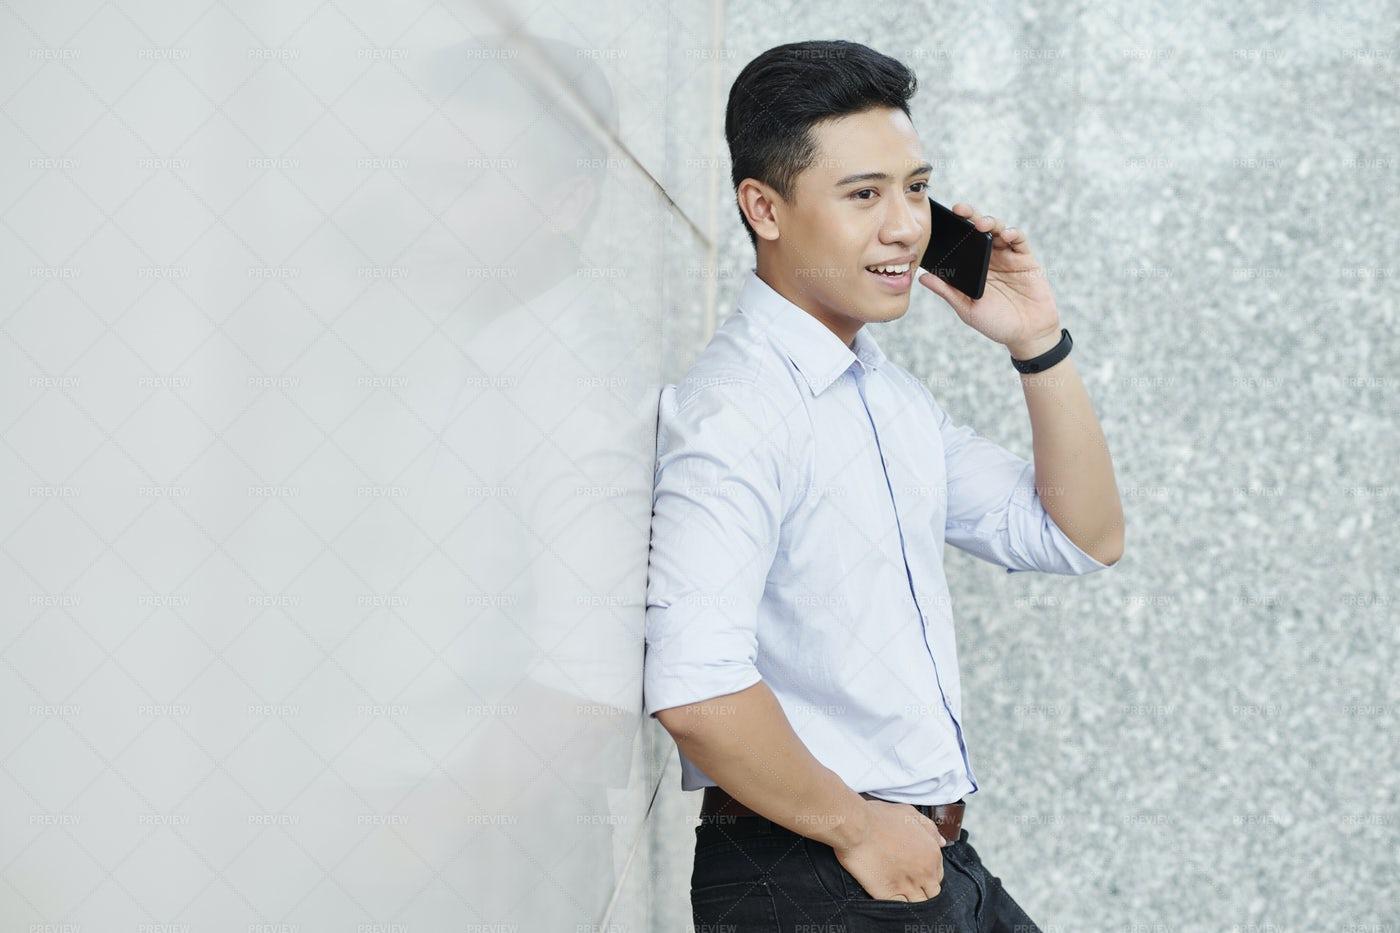 Businessman Making Phone Call: Stock Photos